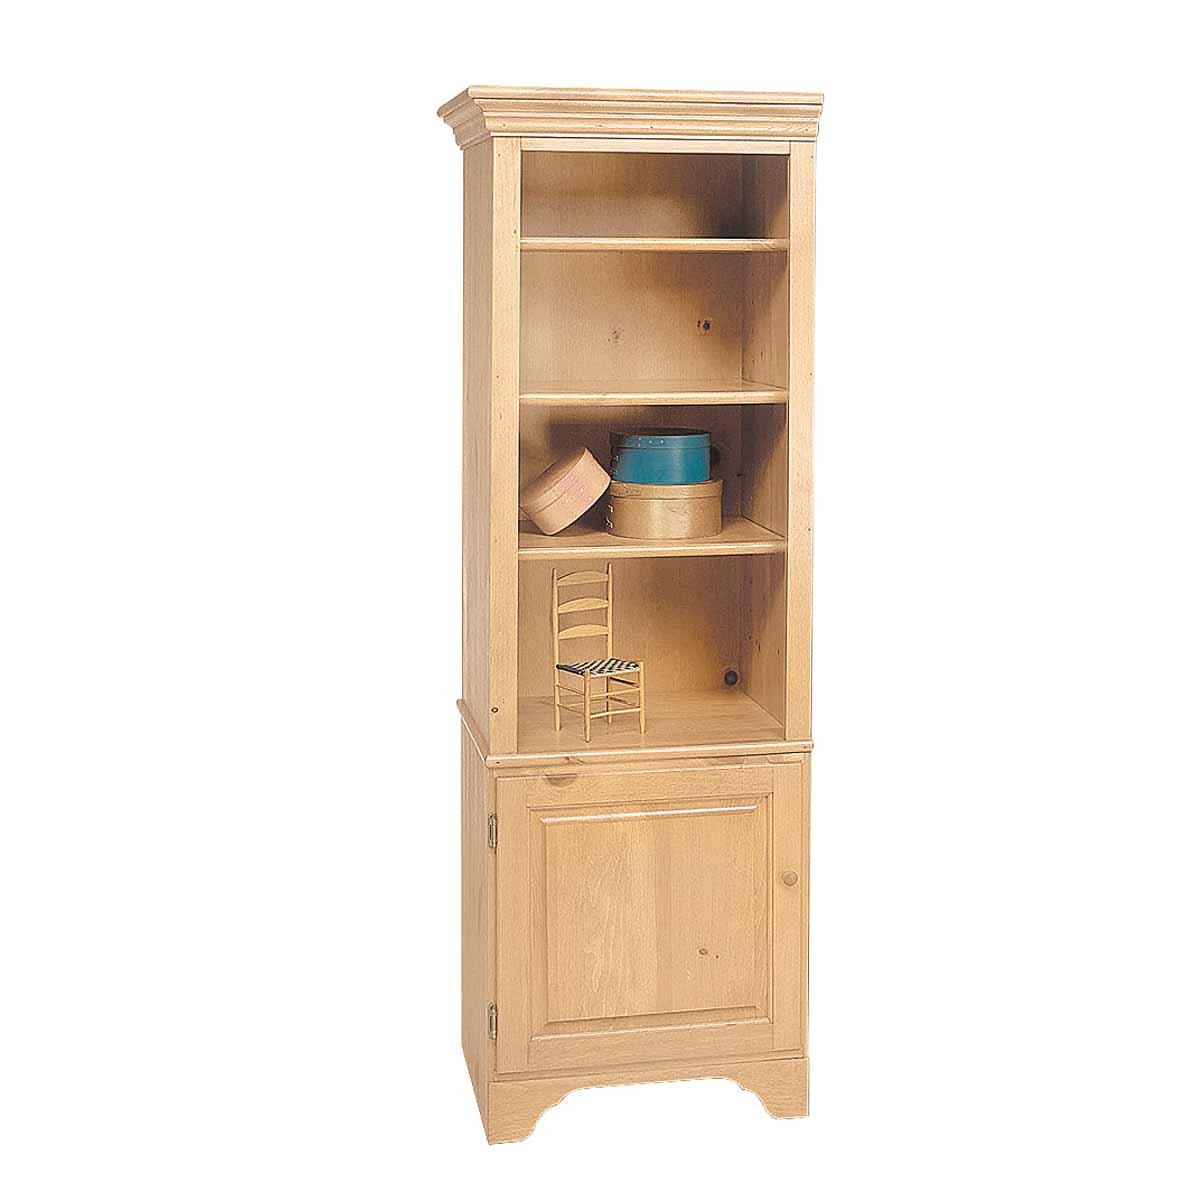 "Unfinished Pine Kitchen Cabinets: Bookcase Unfinished Pine Shaker Kit 66.5""h"